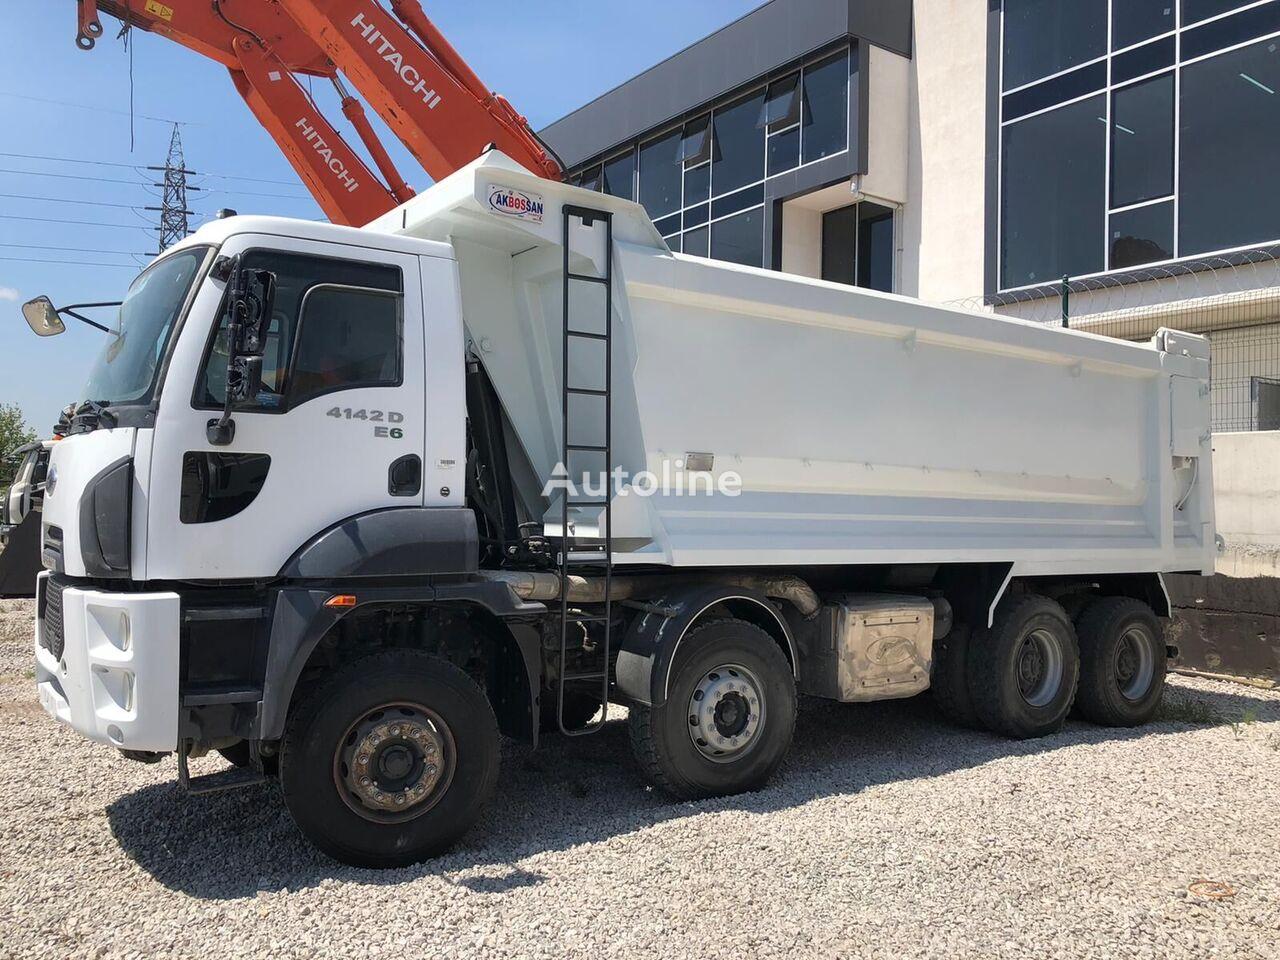 Ford Trucks 4142 D dump truck